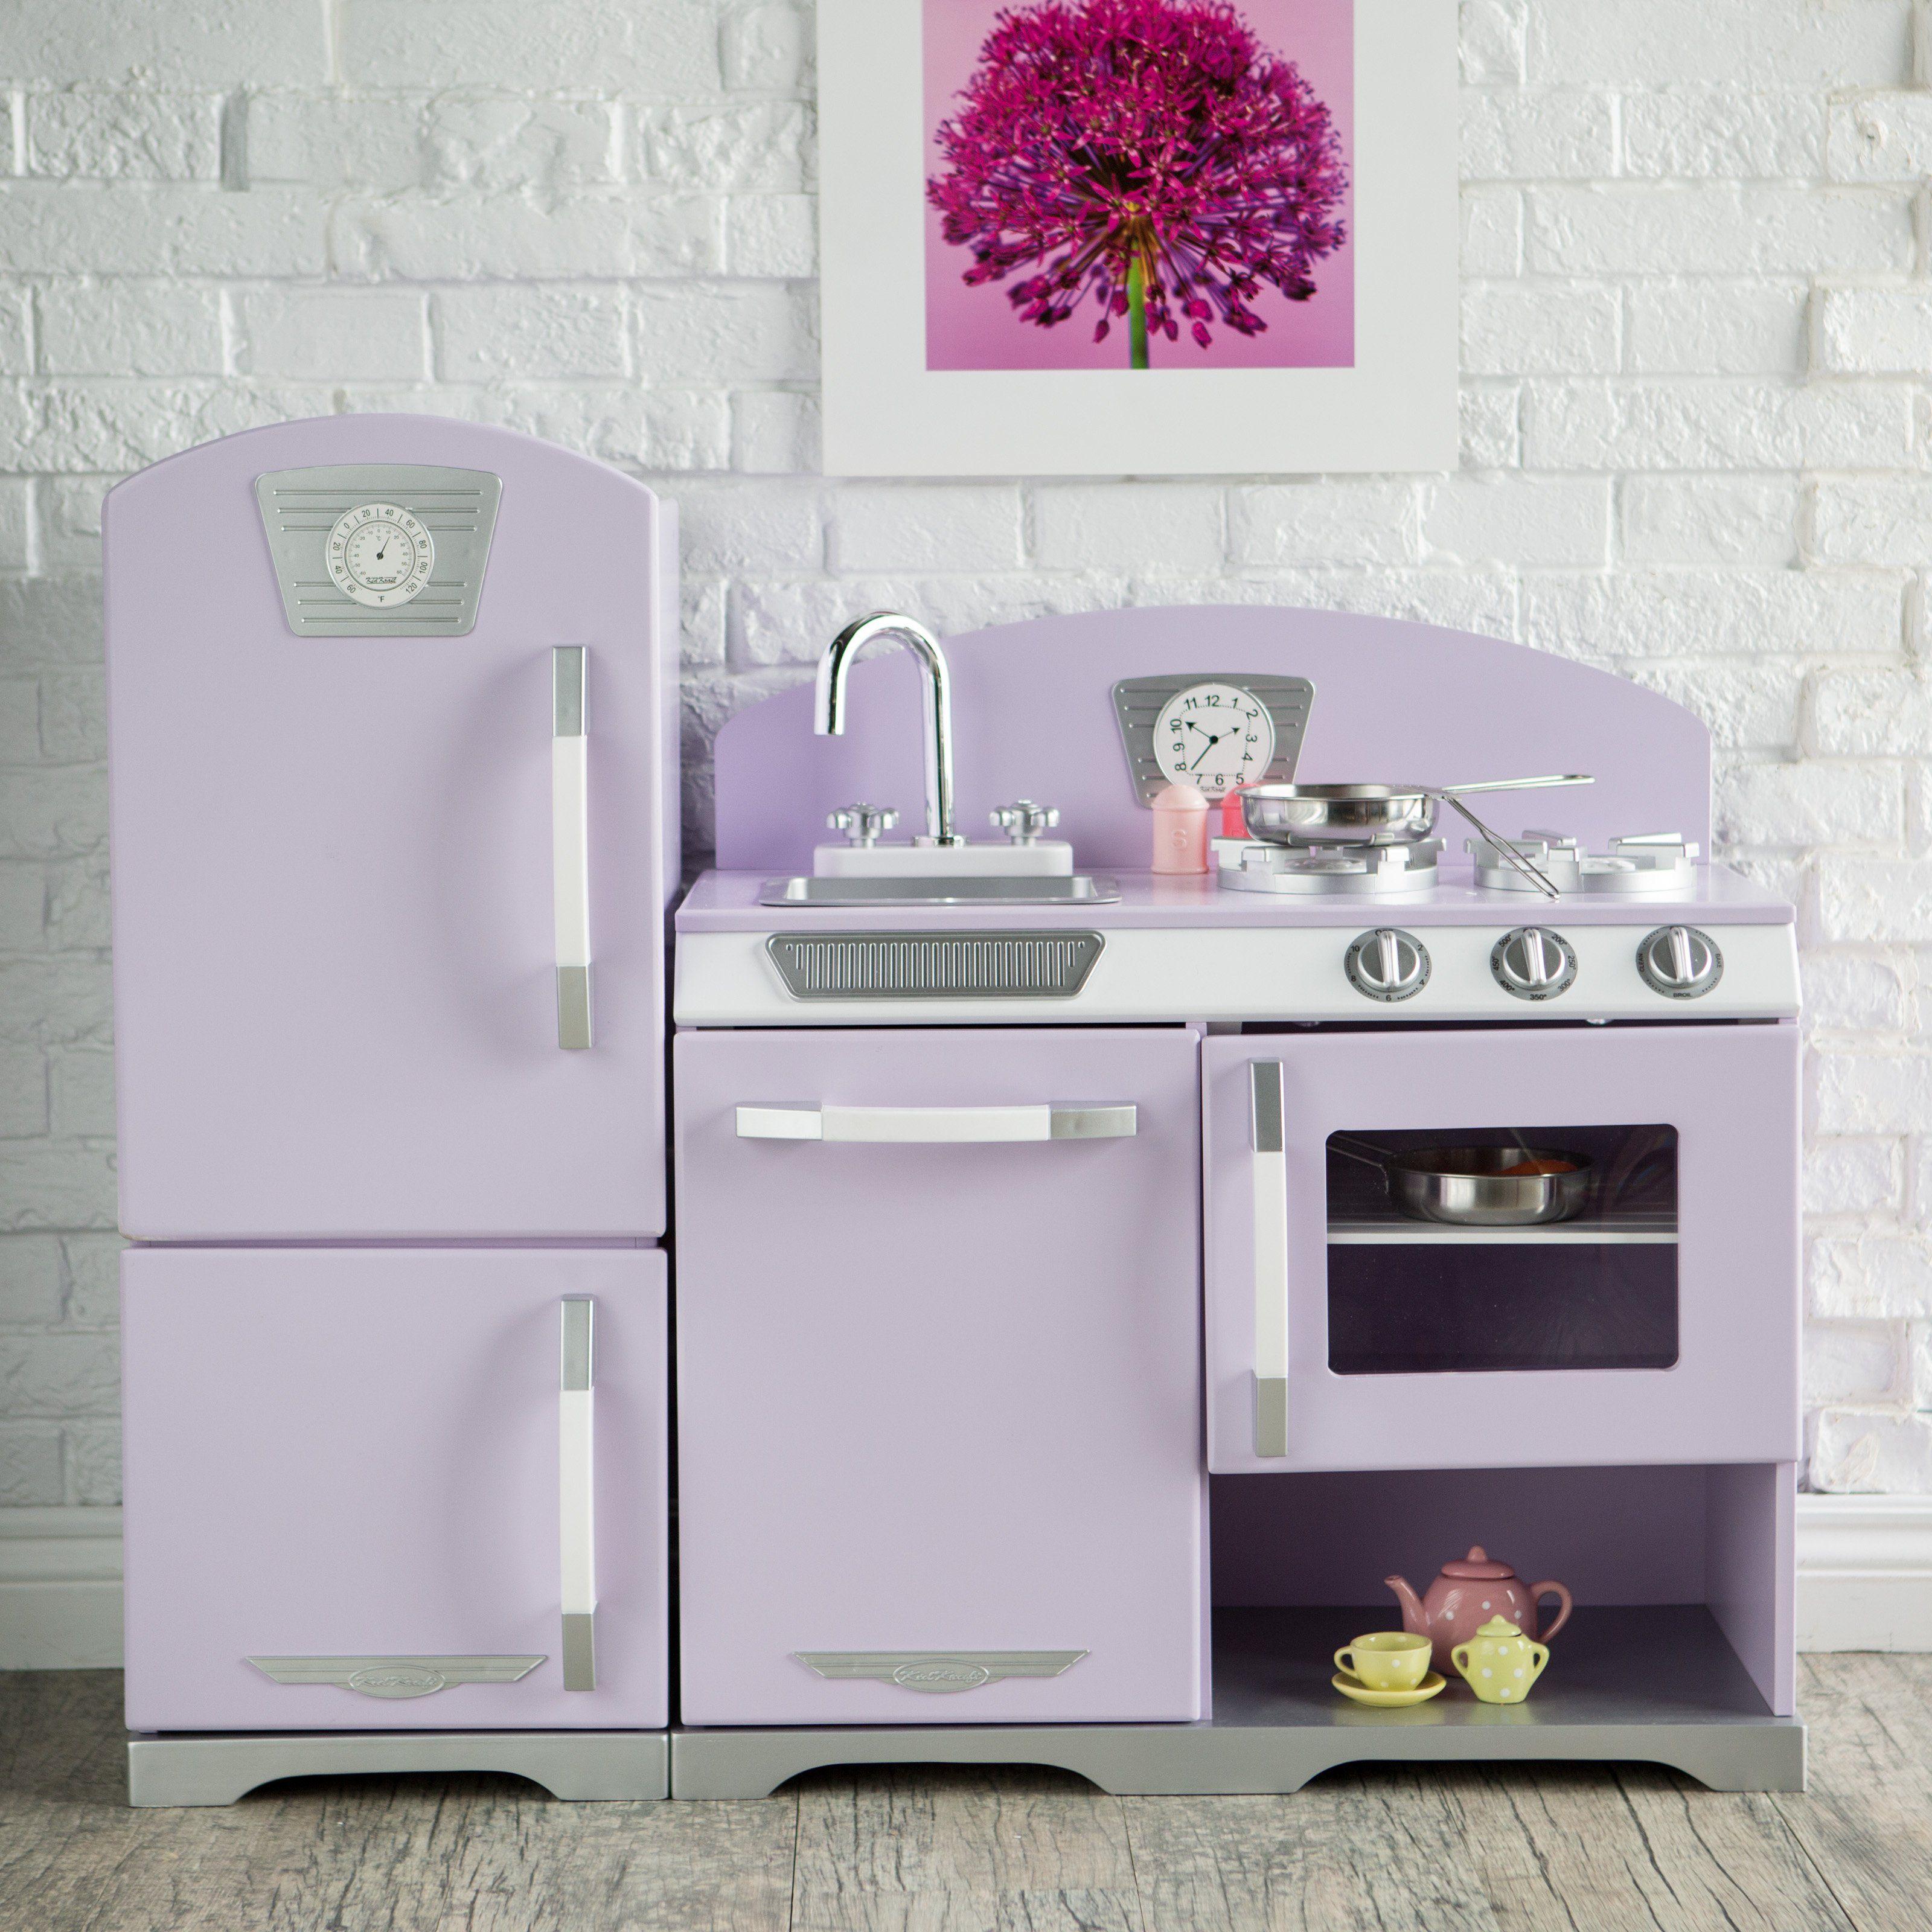 Have To It Kidkraft 2 Piece Lavender Retro Kitchen And Refrigerator 154 09 Diy Kids Furniture